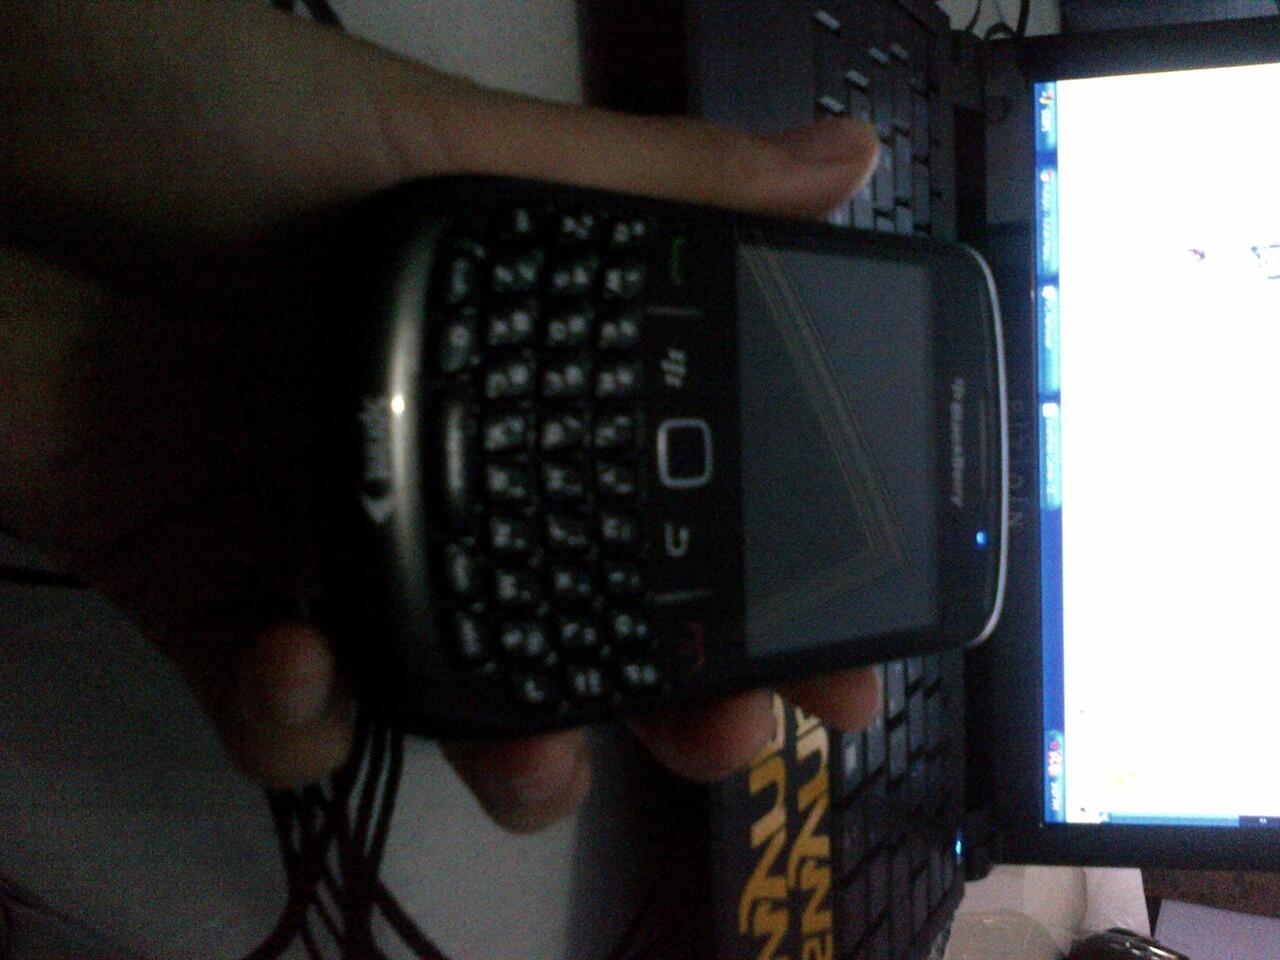 Jual blackberry 8530 white dan 8520 black